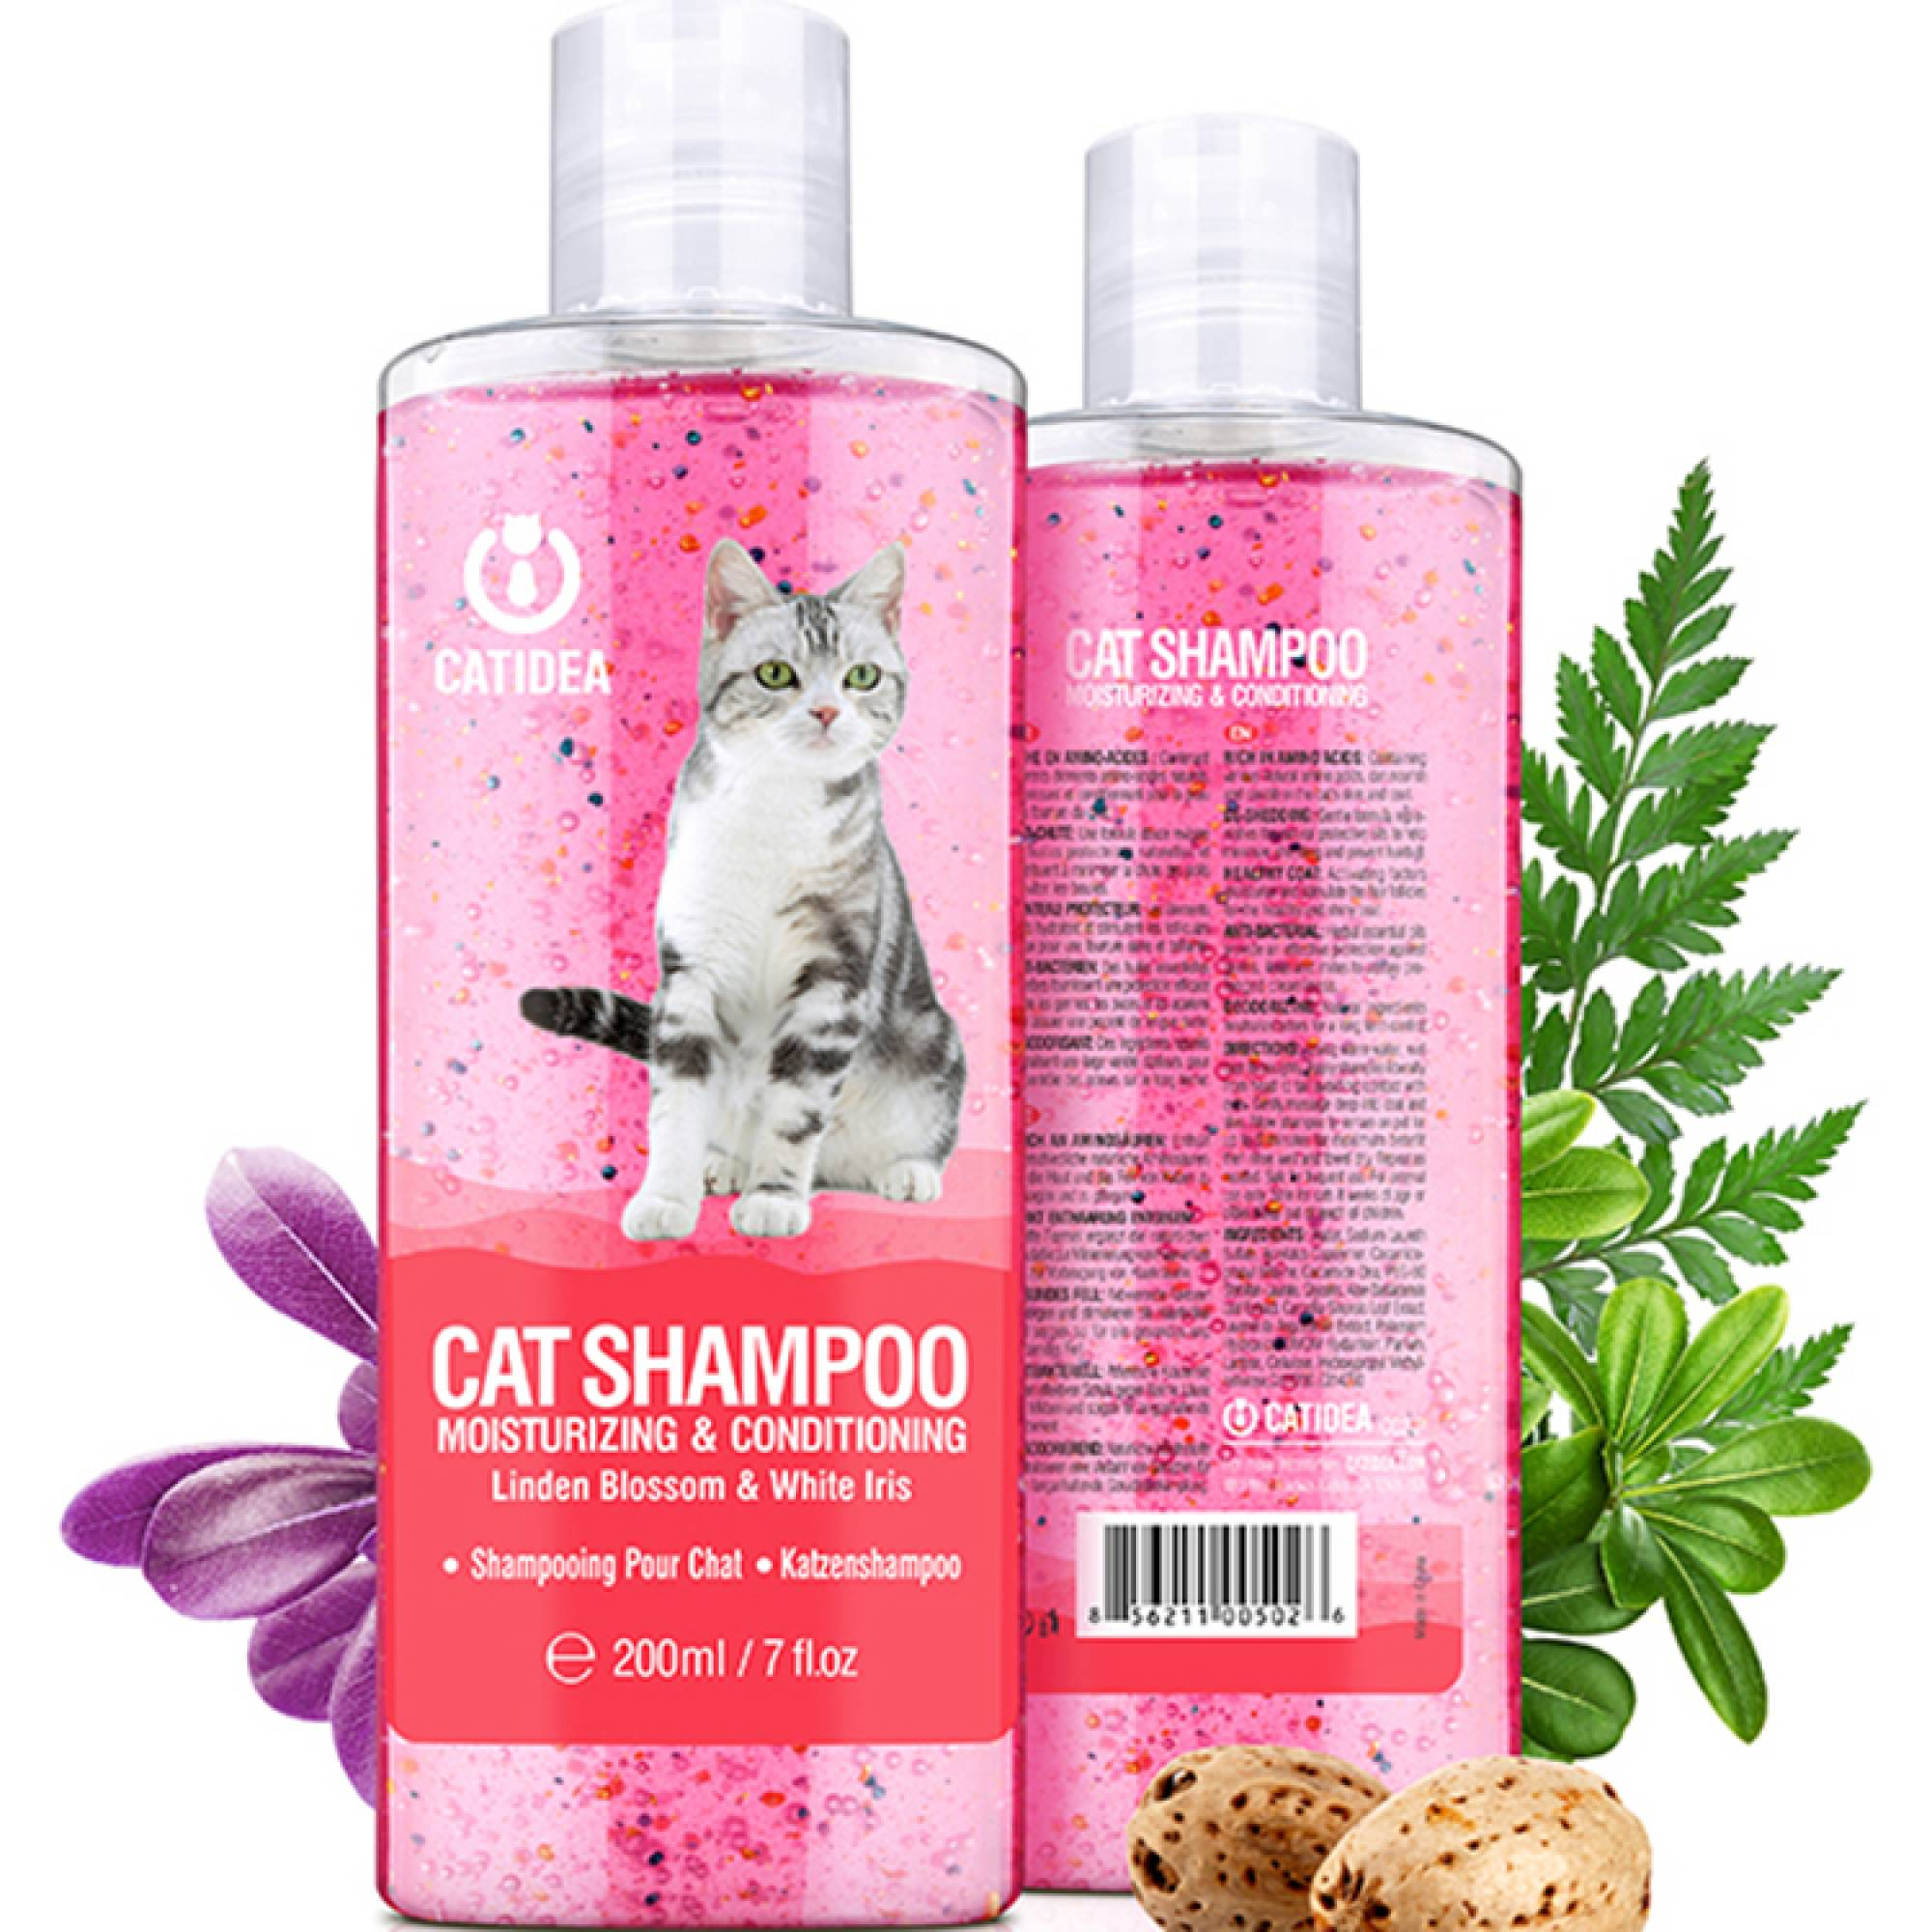 CATIDEA - CC2 Cat Shampoo Moisturizing & Conditioning 200ml - Linden Blossom & White Iris